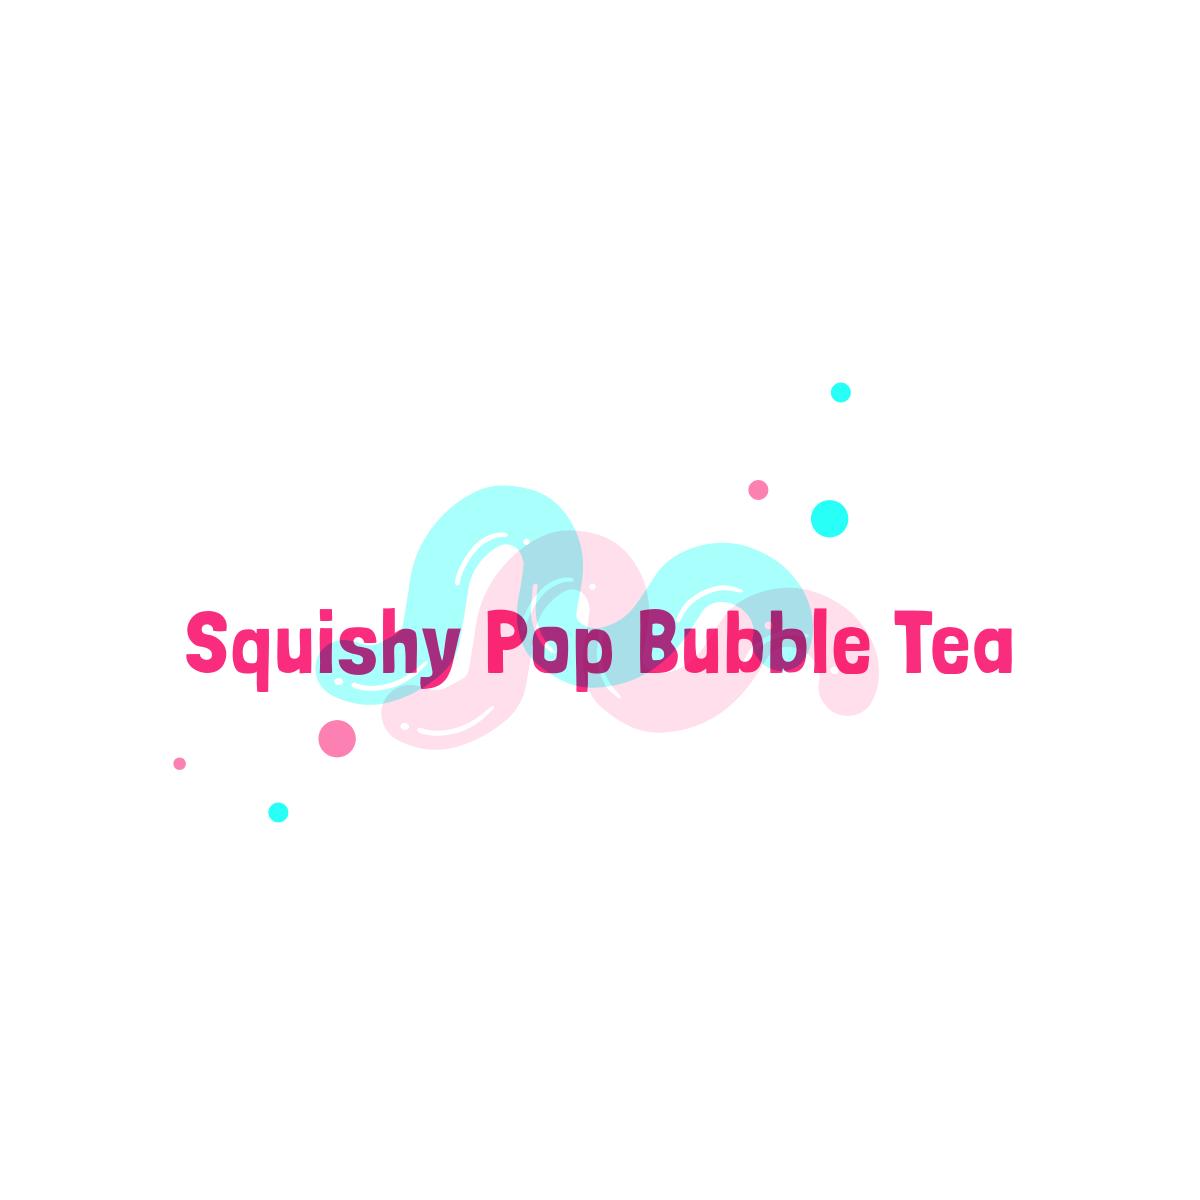 Squishy Pop Bubble Tea